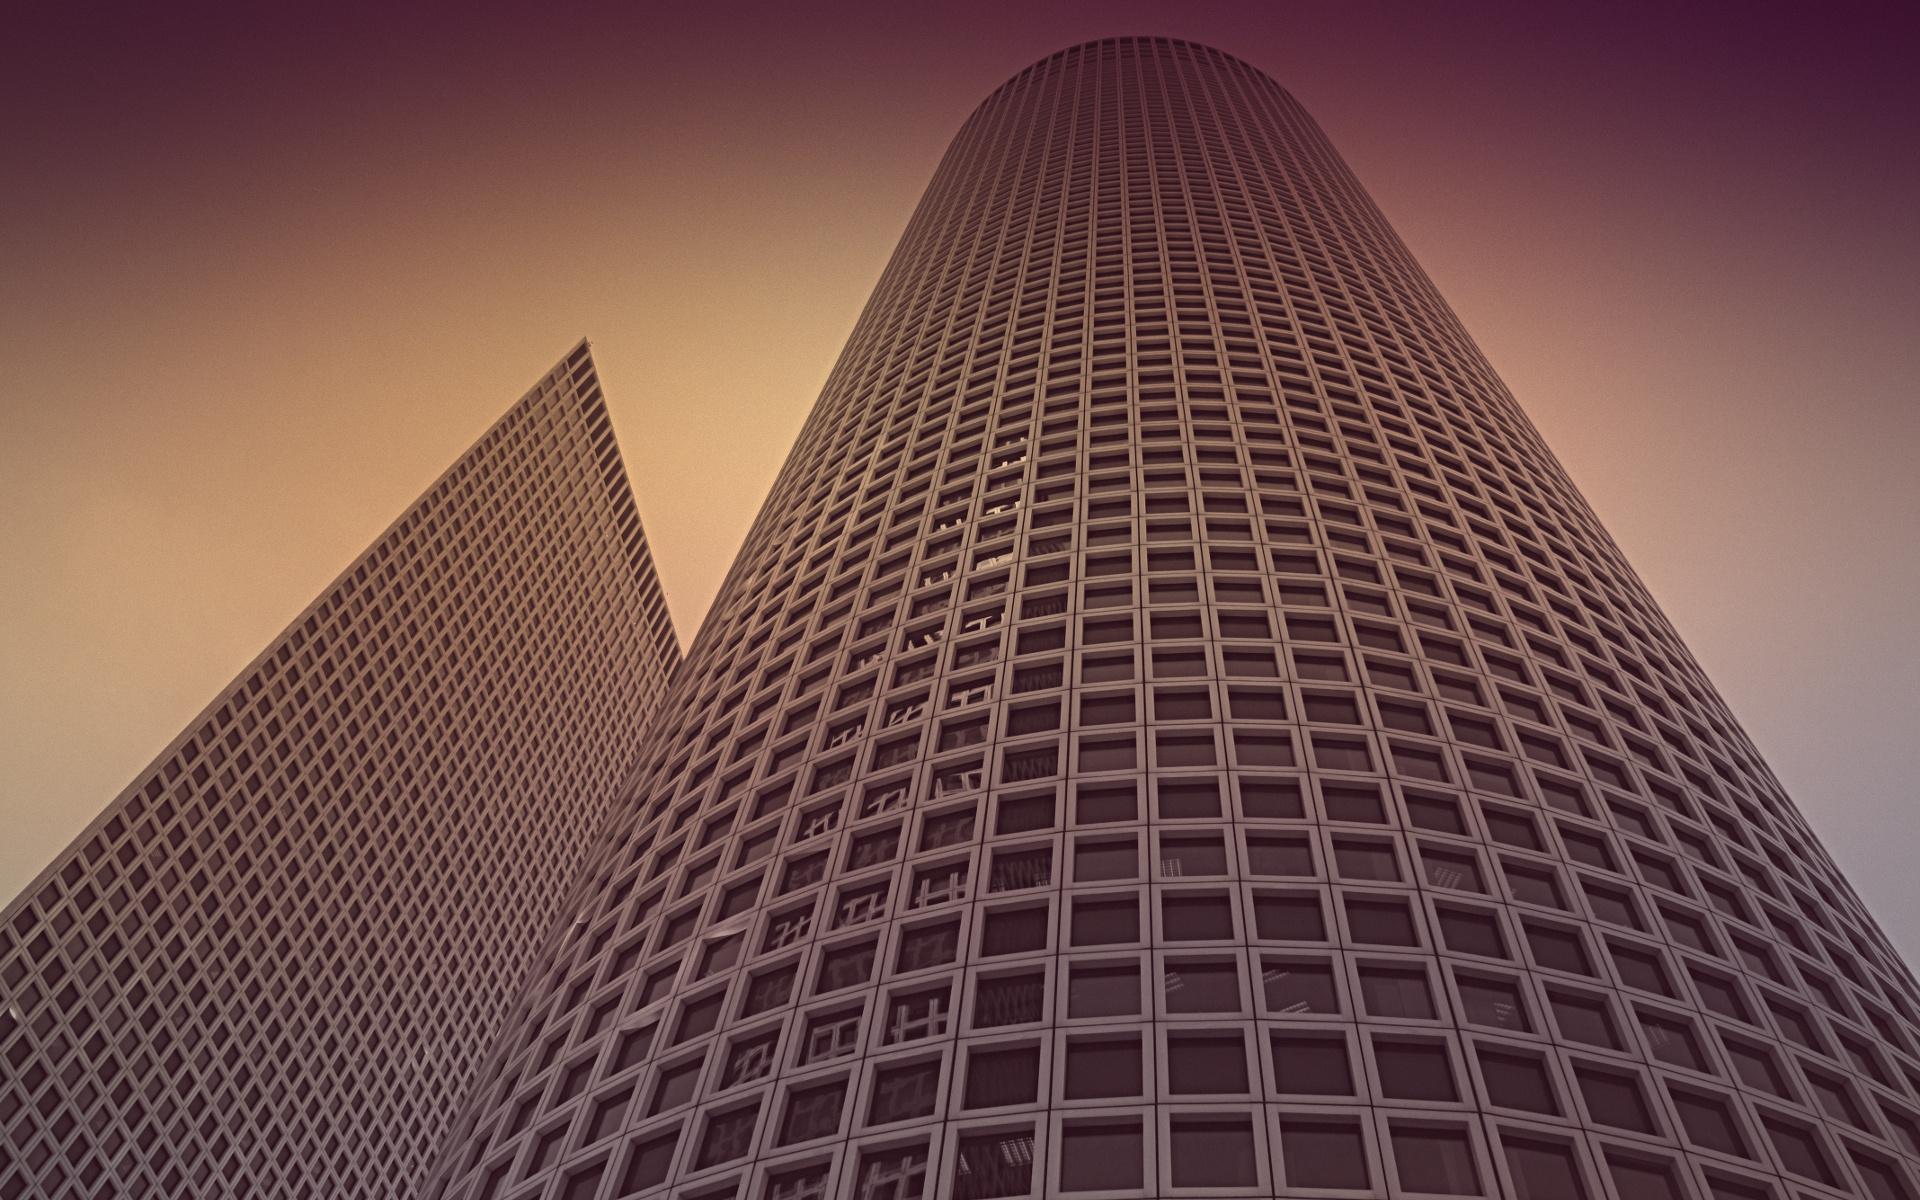 Postmodern, Building, Tower Wallpaper, HD City 4K